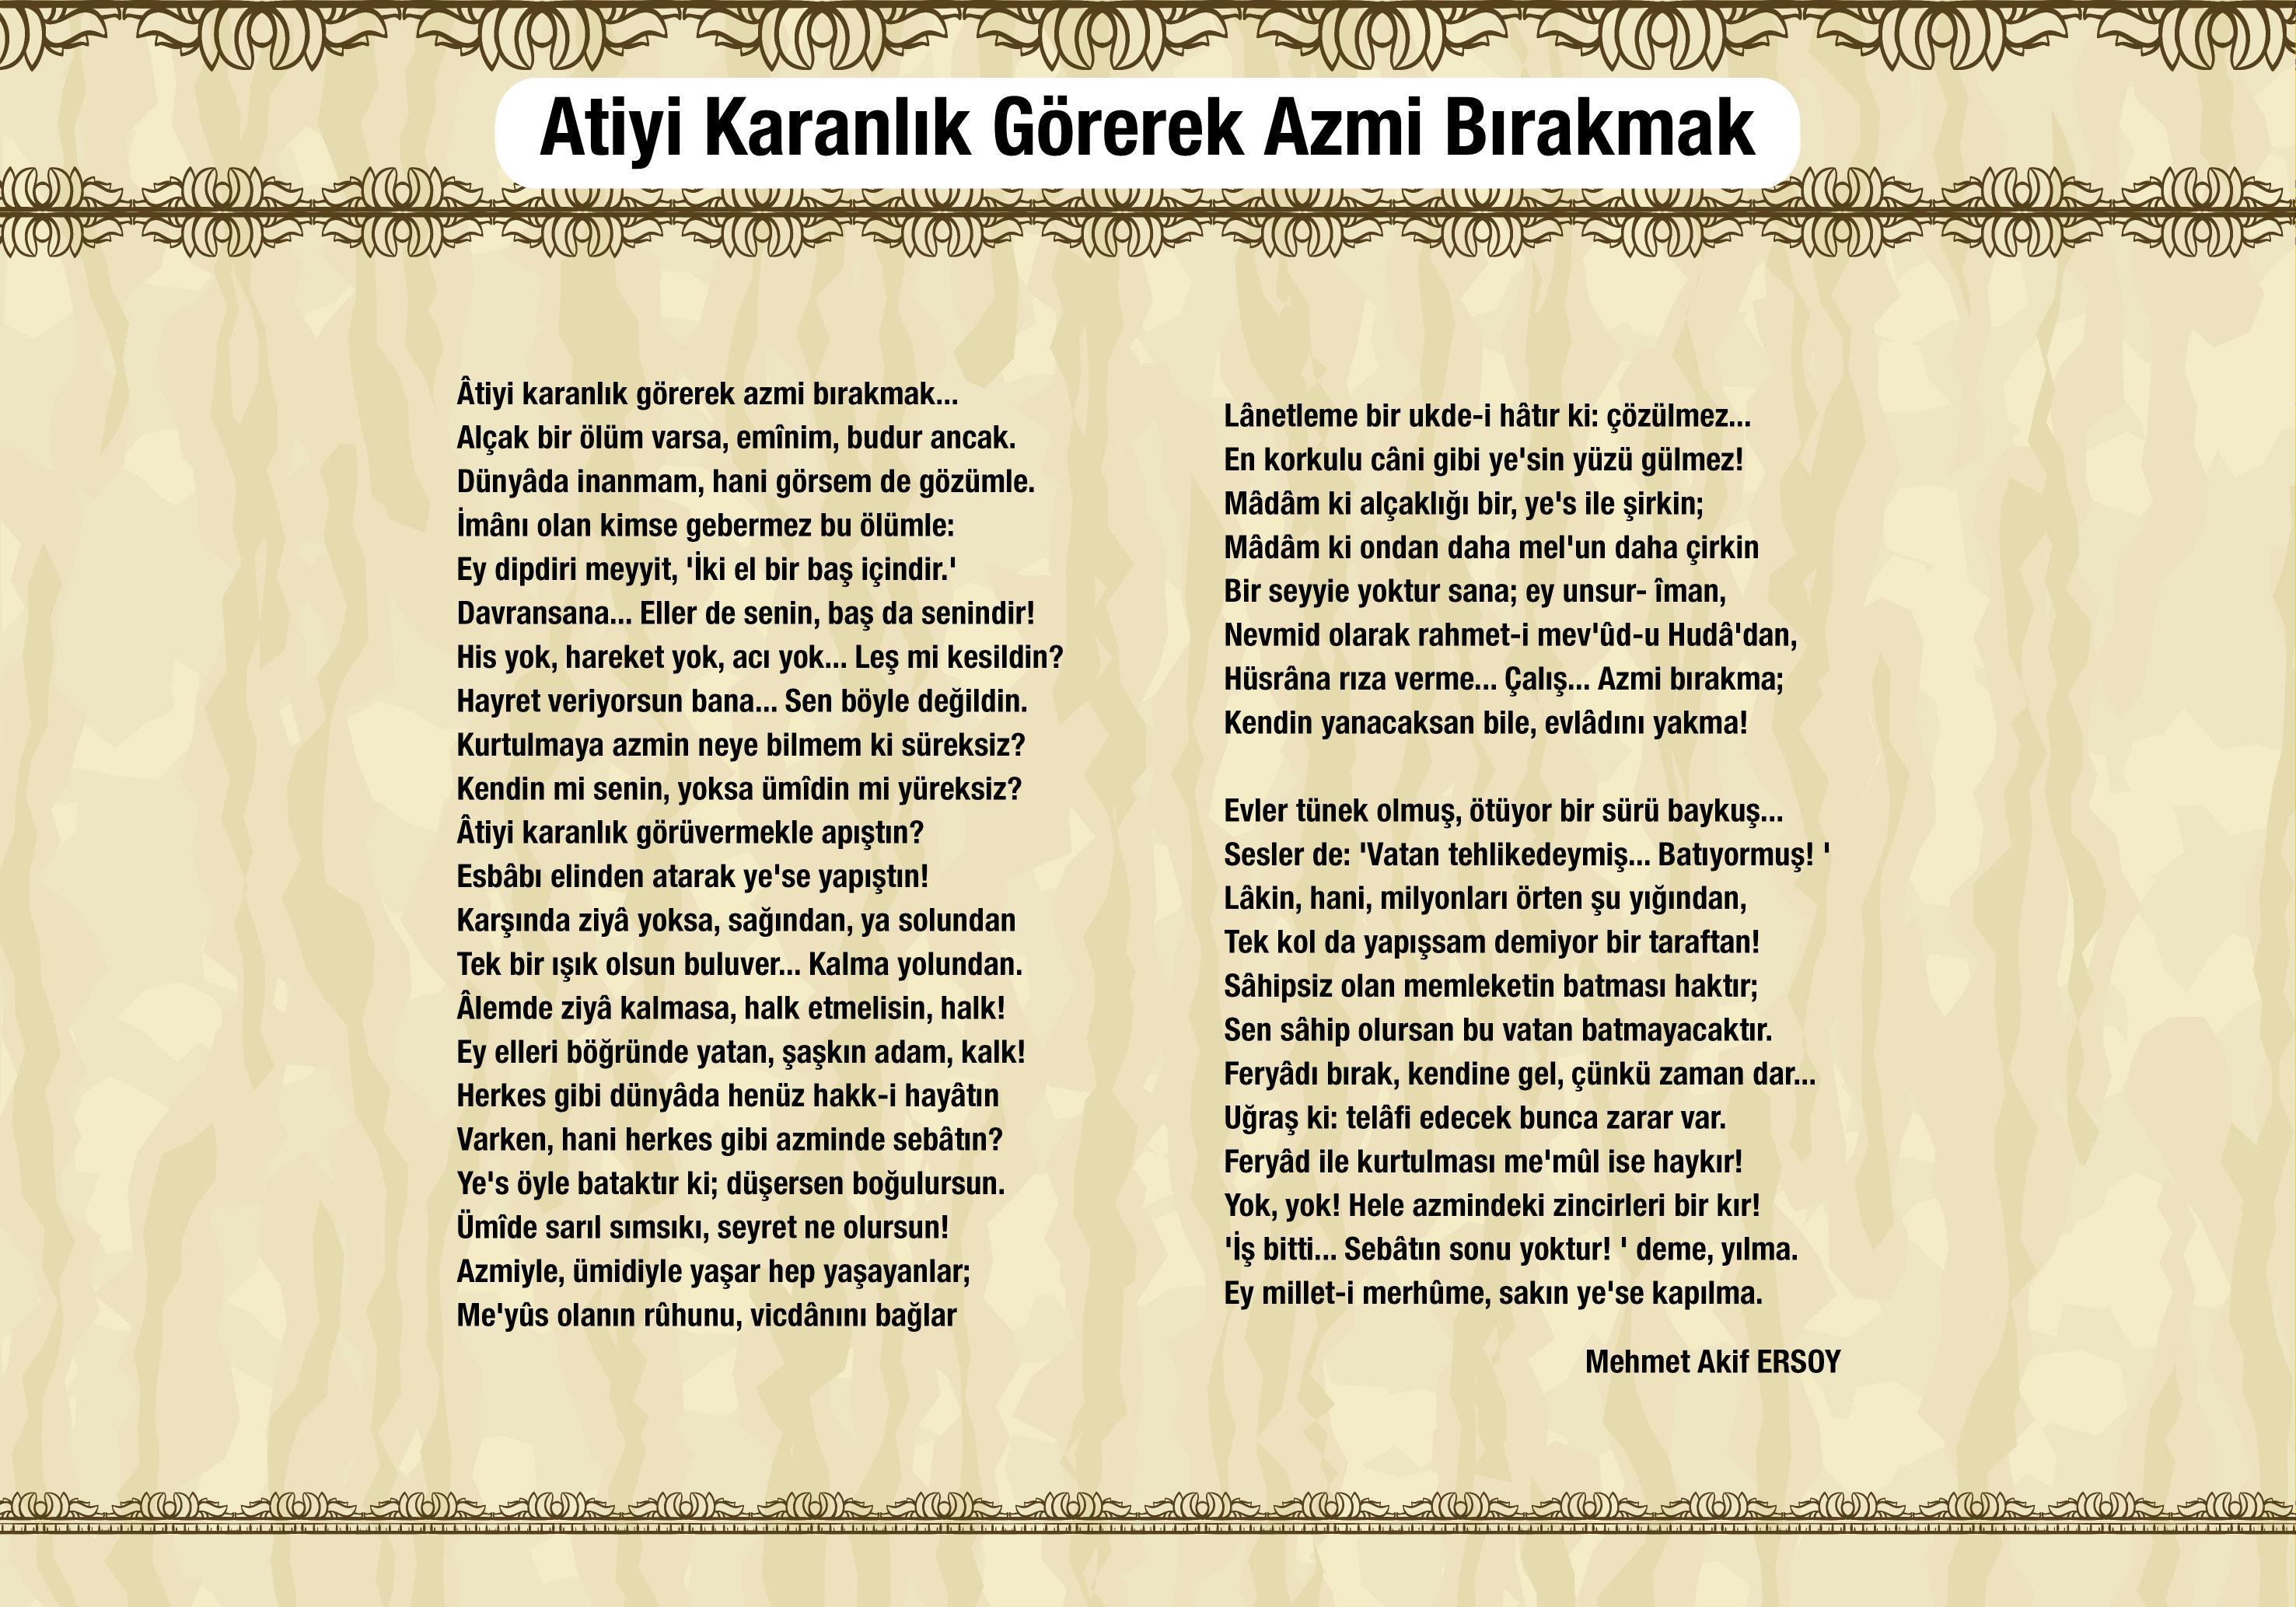 Atiyi karanlık görerek azmi bırakmak - Mehmet Akif Ersoy - Safahat